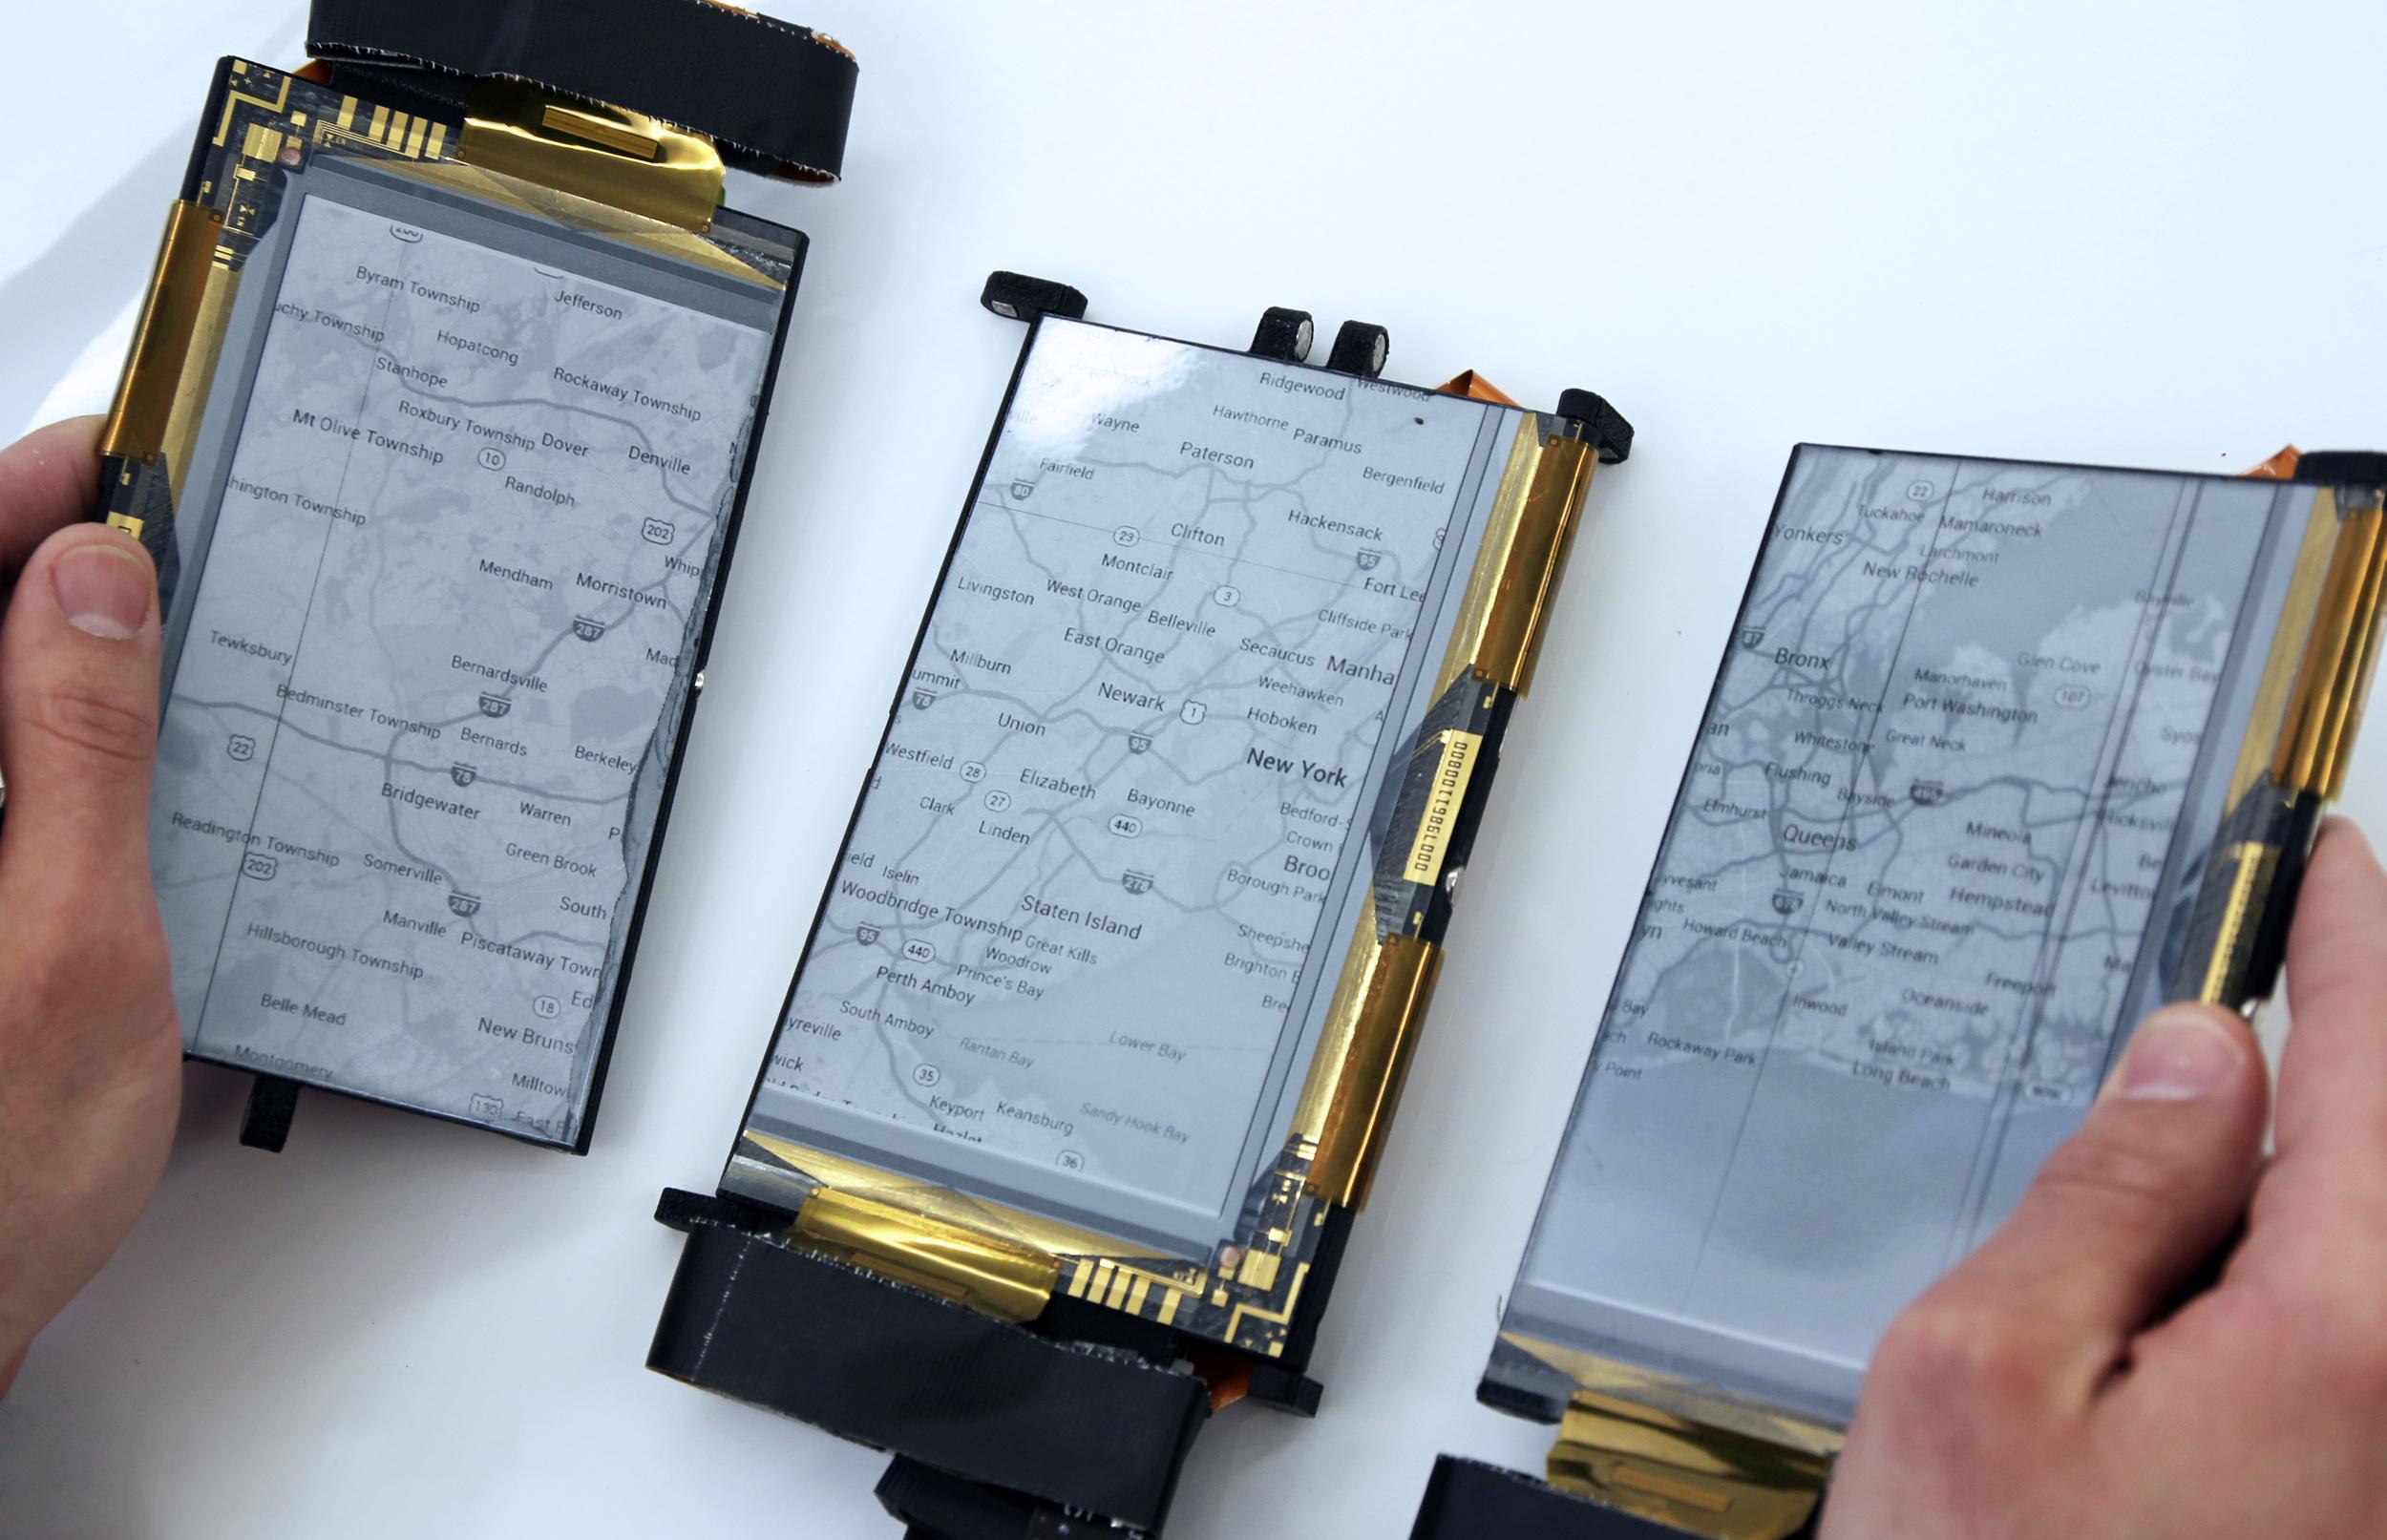 paperfold (2014): detachable screen configurations allow multitude of form factors